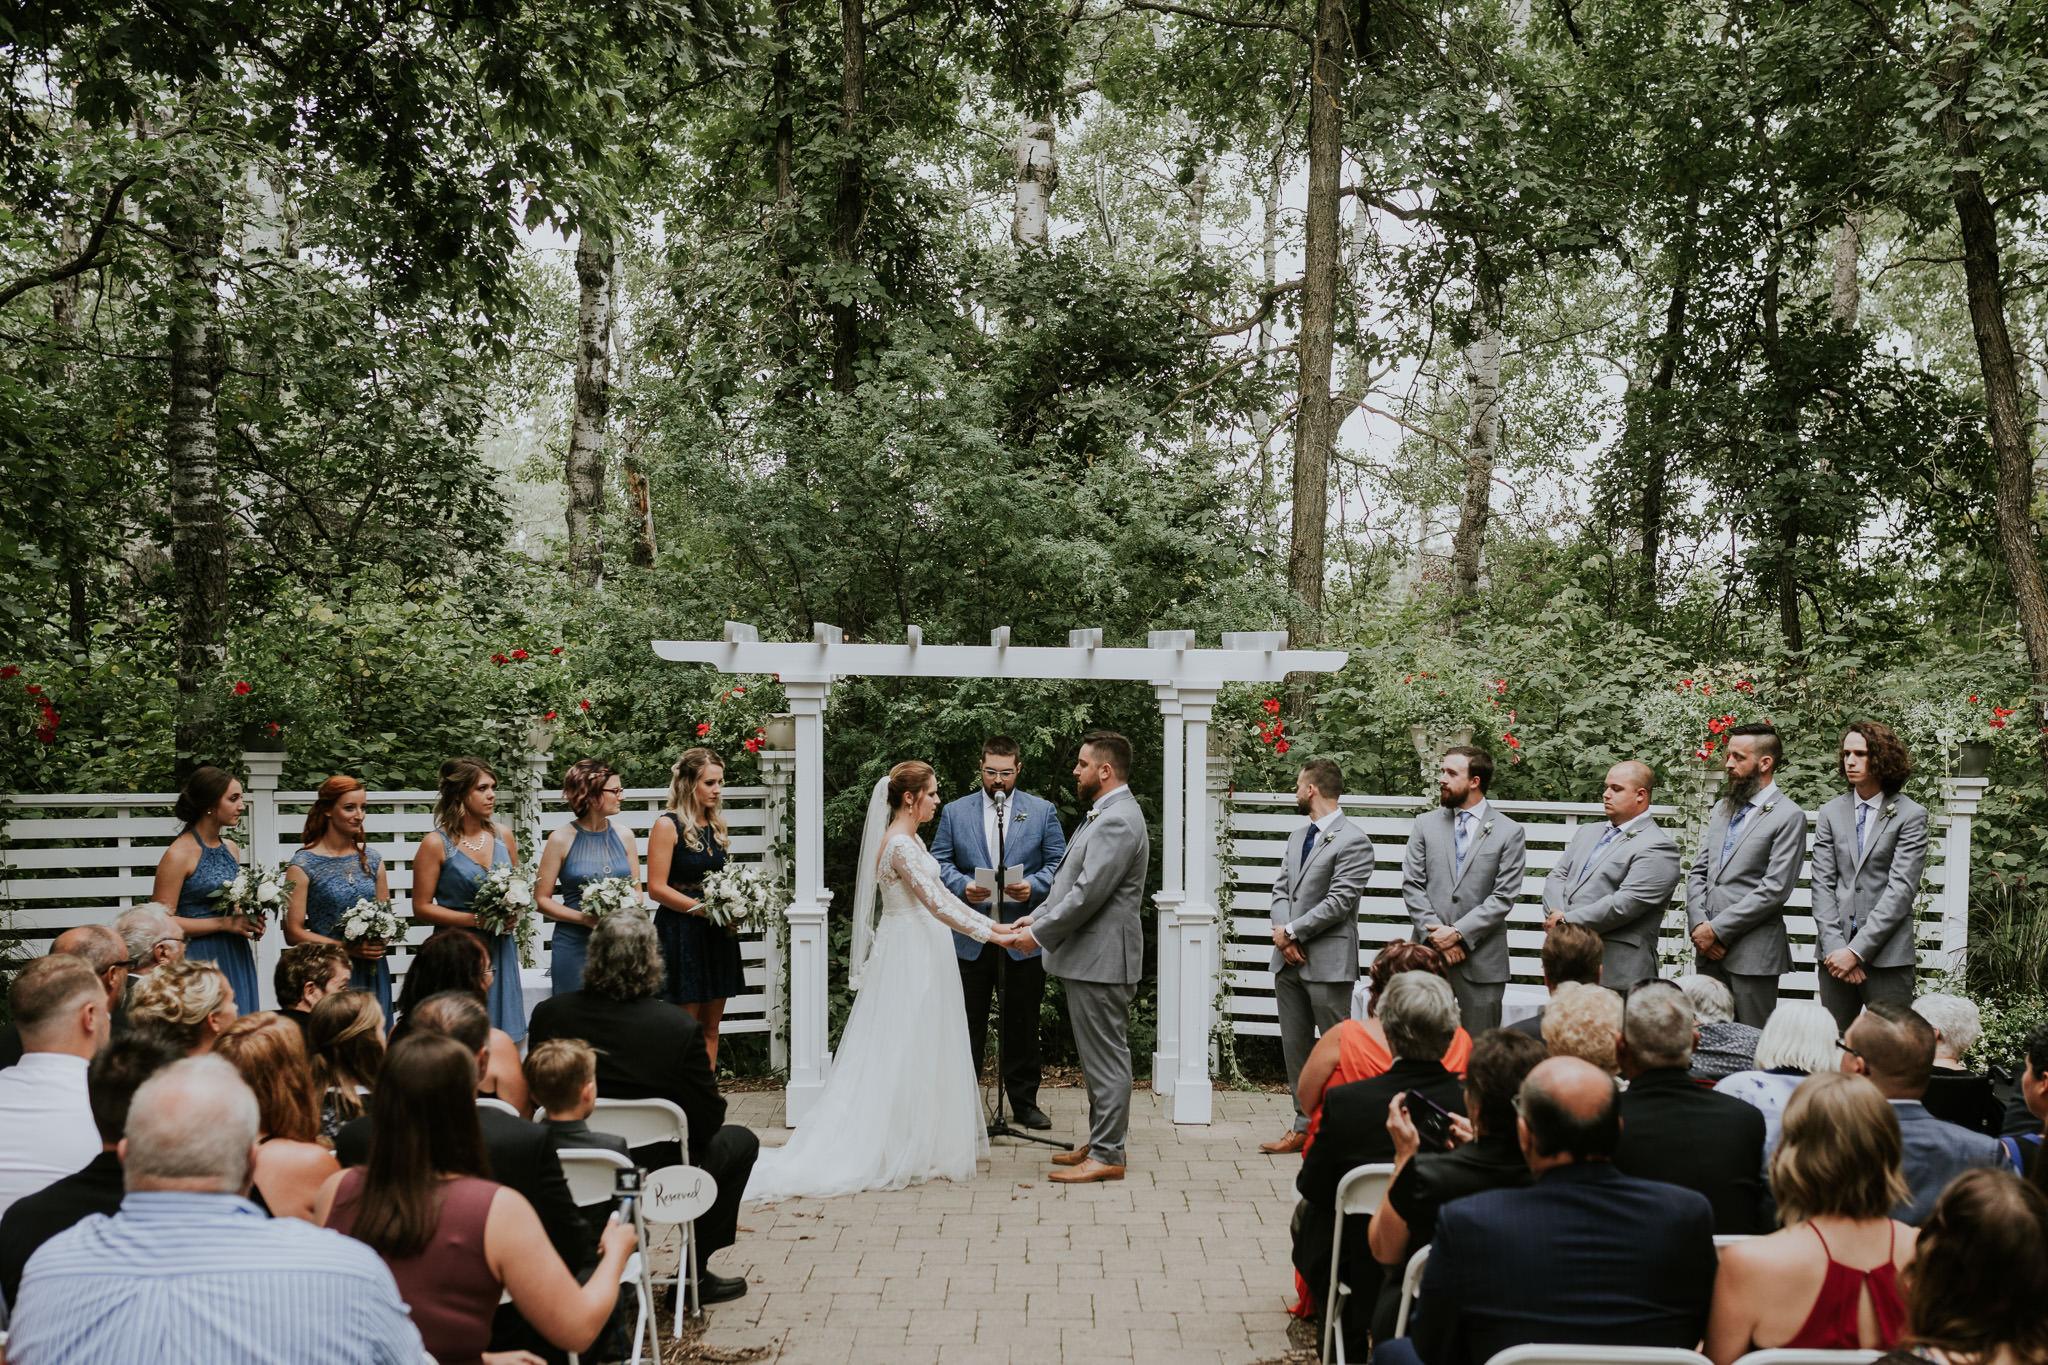 pine-ridge-golf-course-winnipeg-wedding-71.jpg